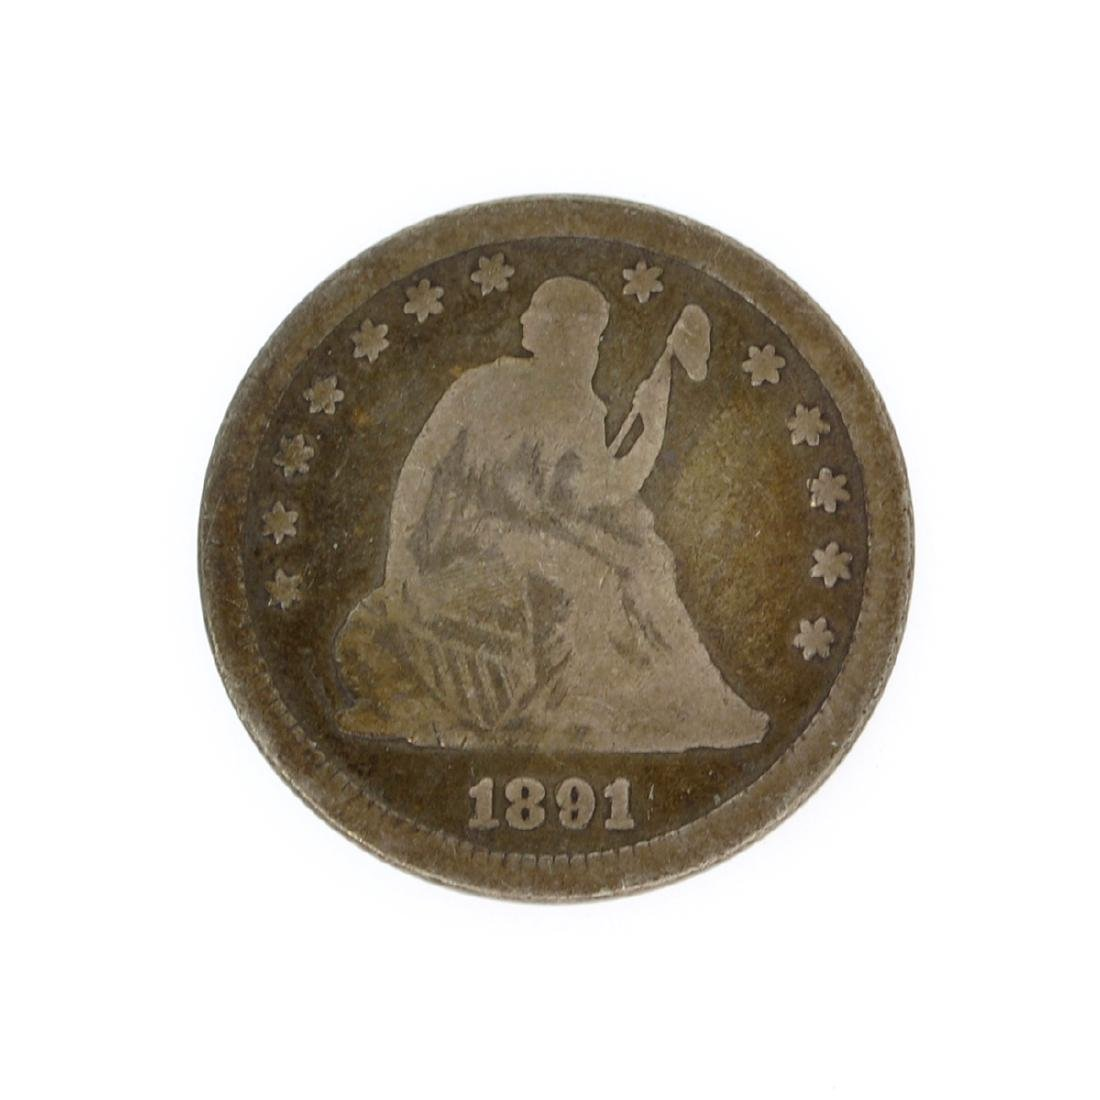 Rare 1891 Liberty Seated Quarter Dollar Coin